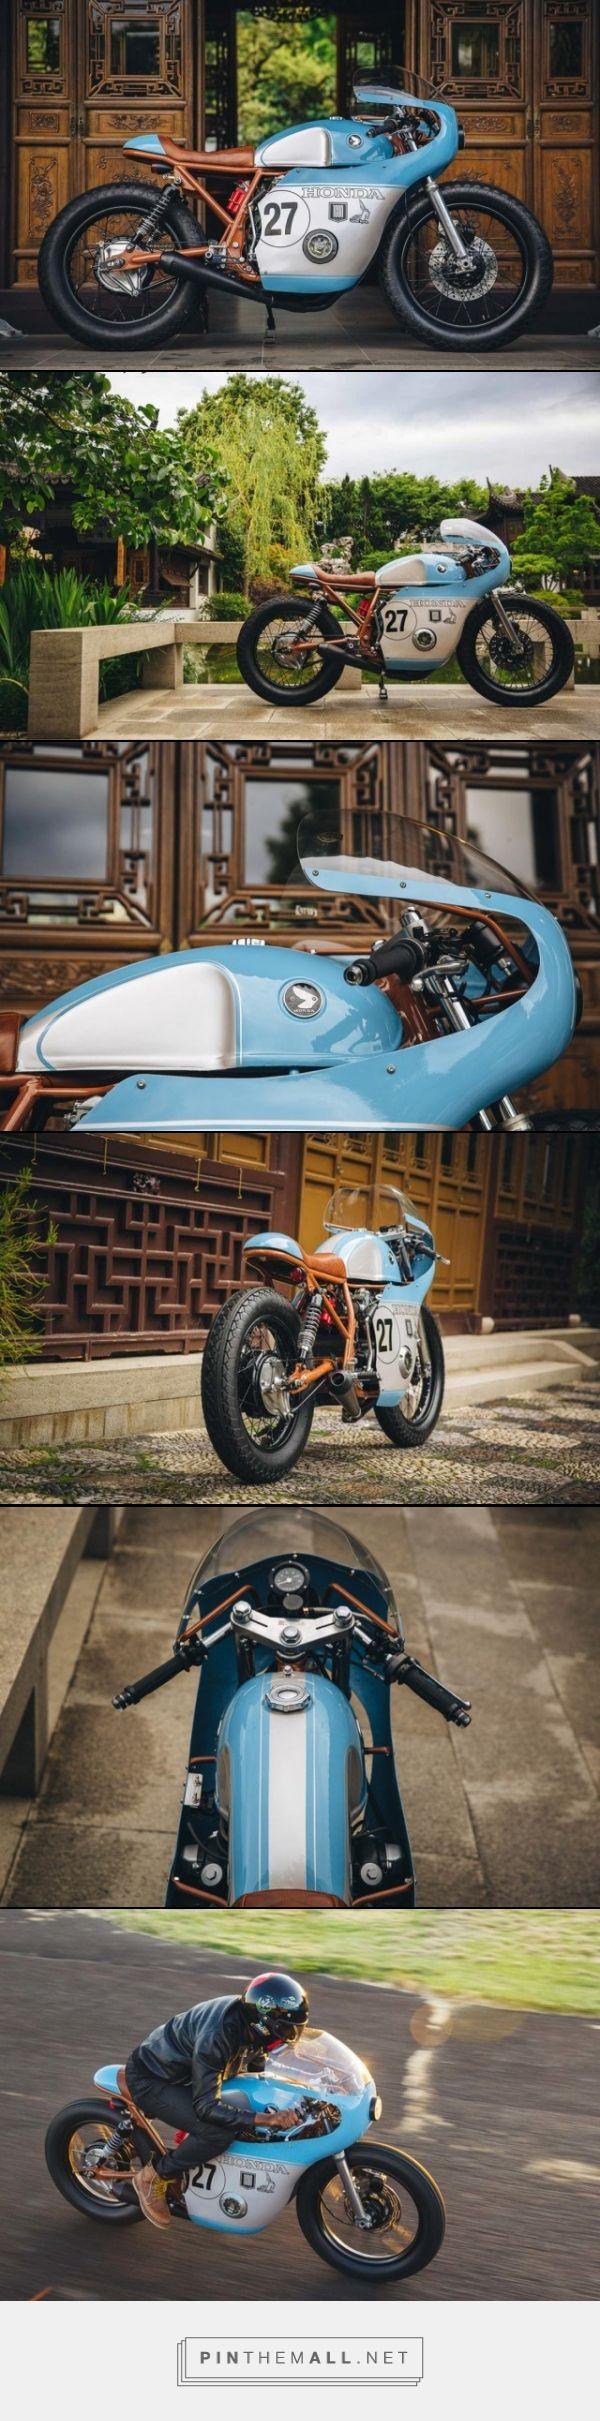 1977 Honda CB 550 by Little Horse Cycles [CFCM]